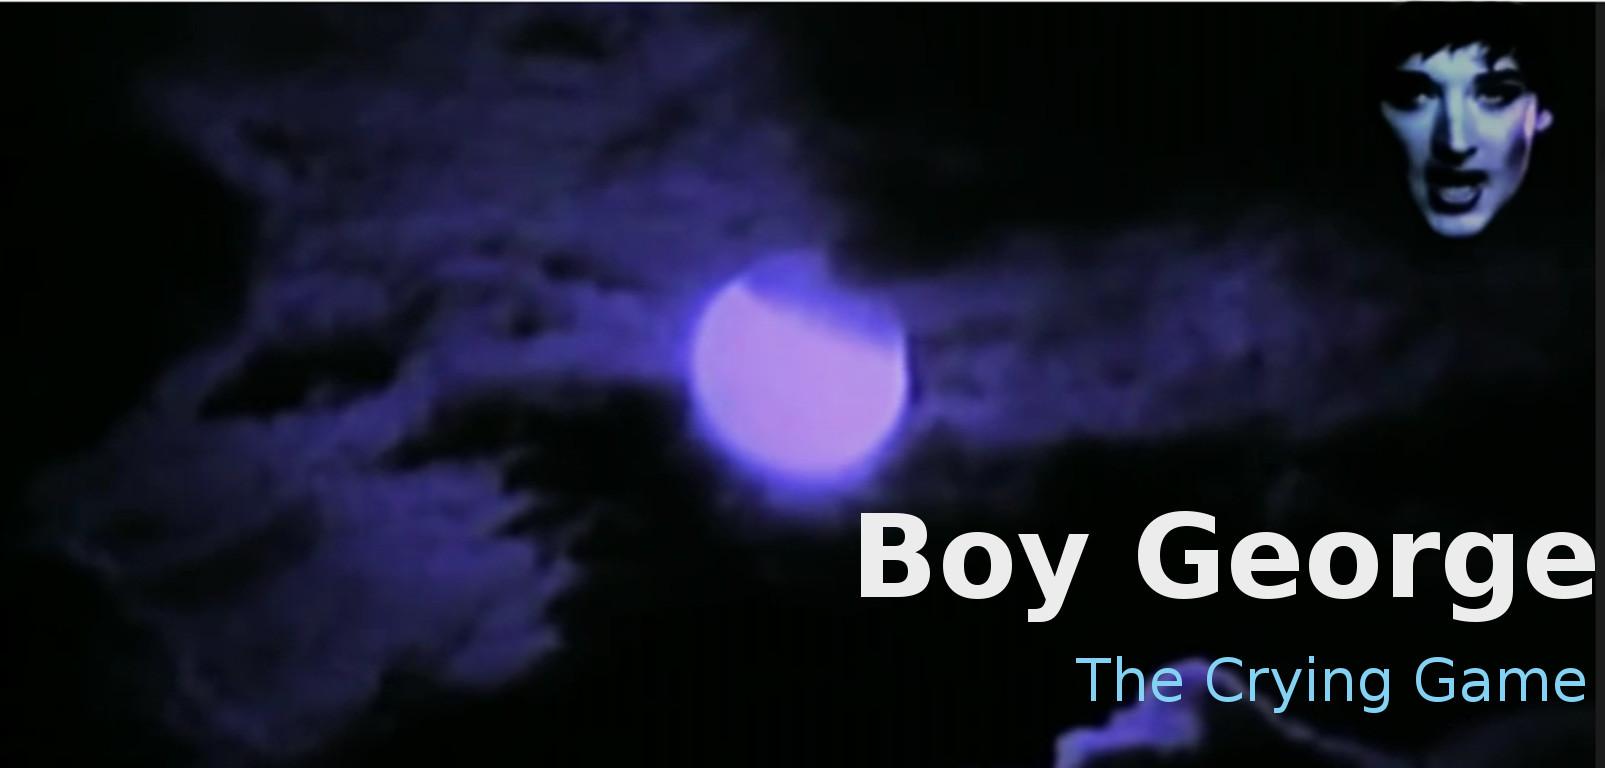 boy george crying game lyrics